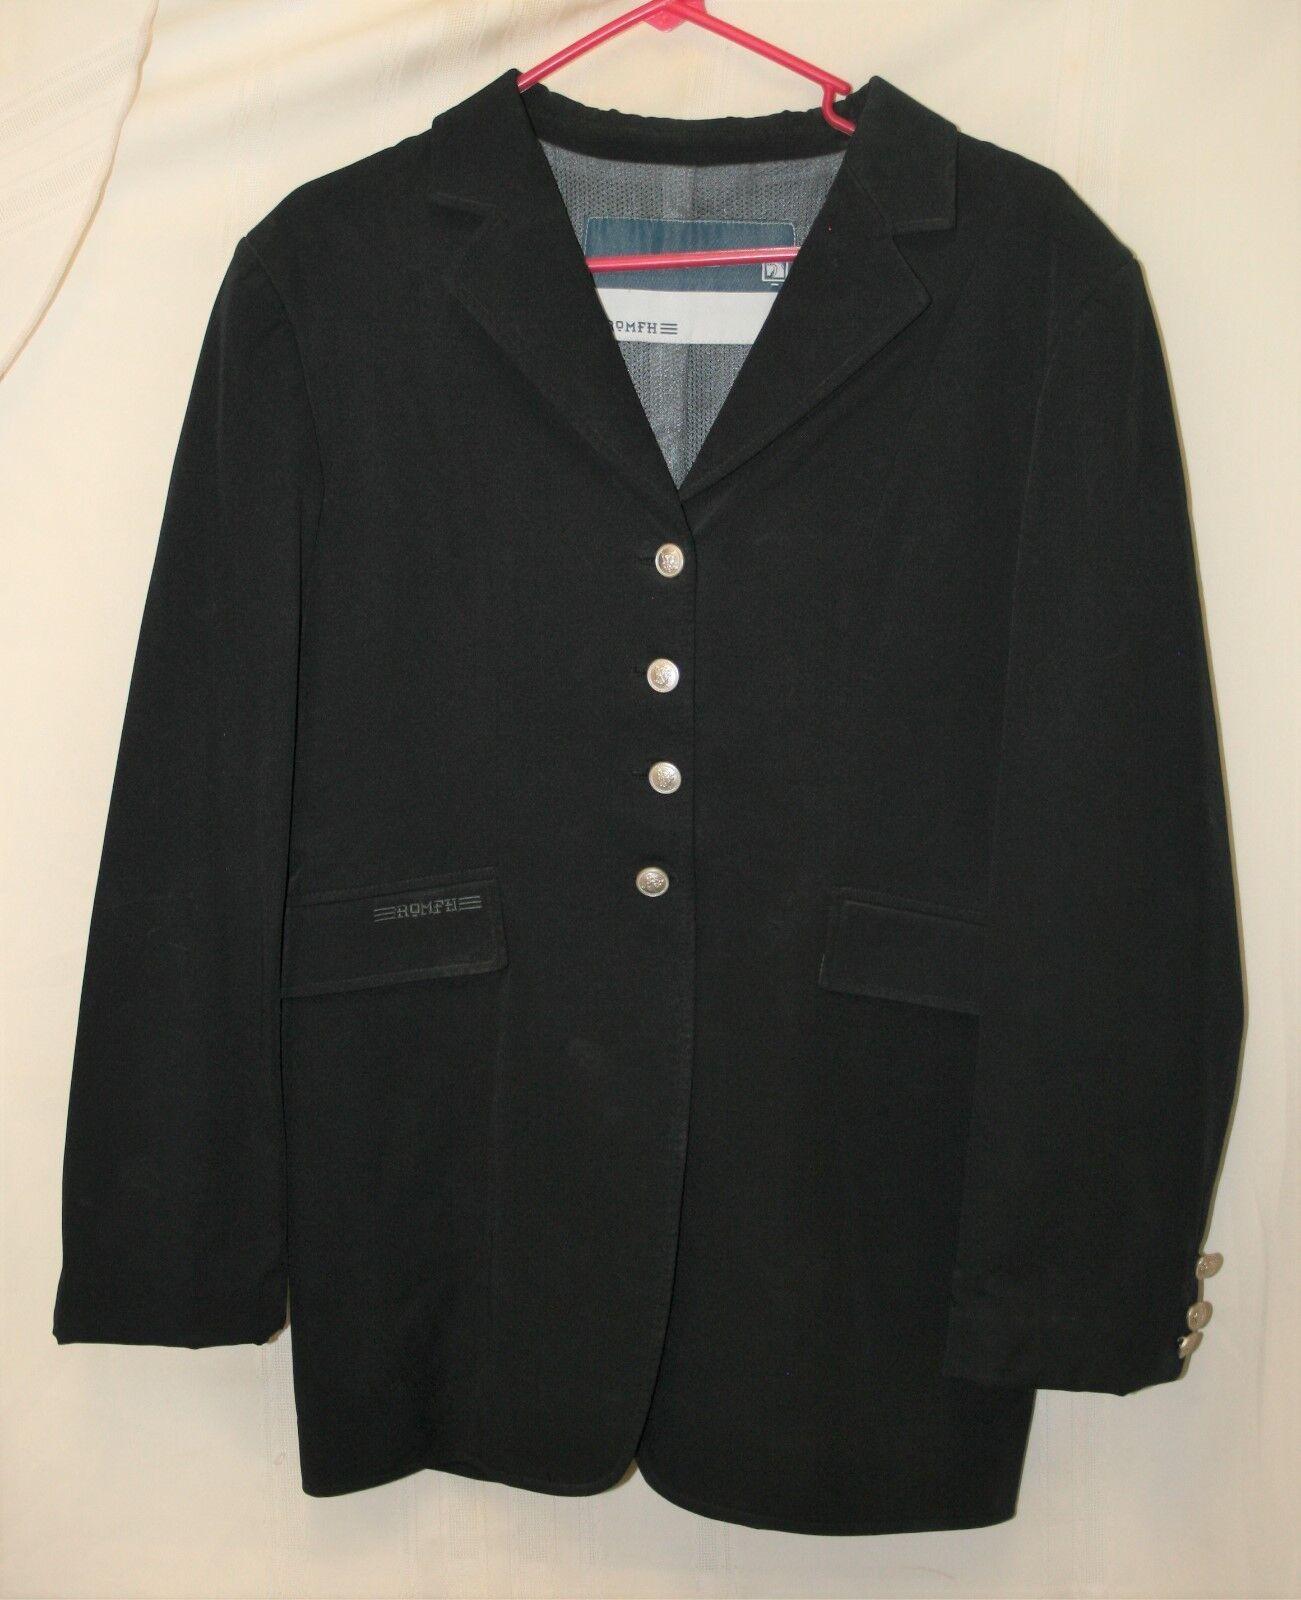 USED Romfh Dressage Show Coat - Size 14